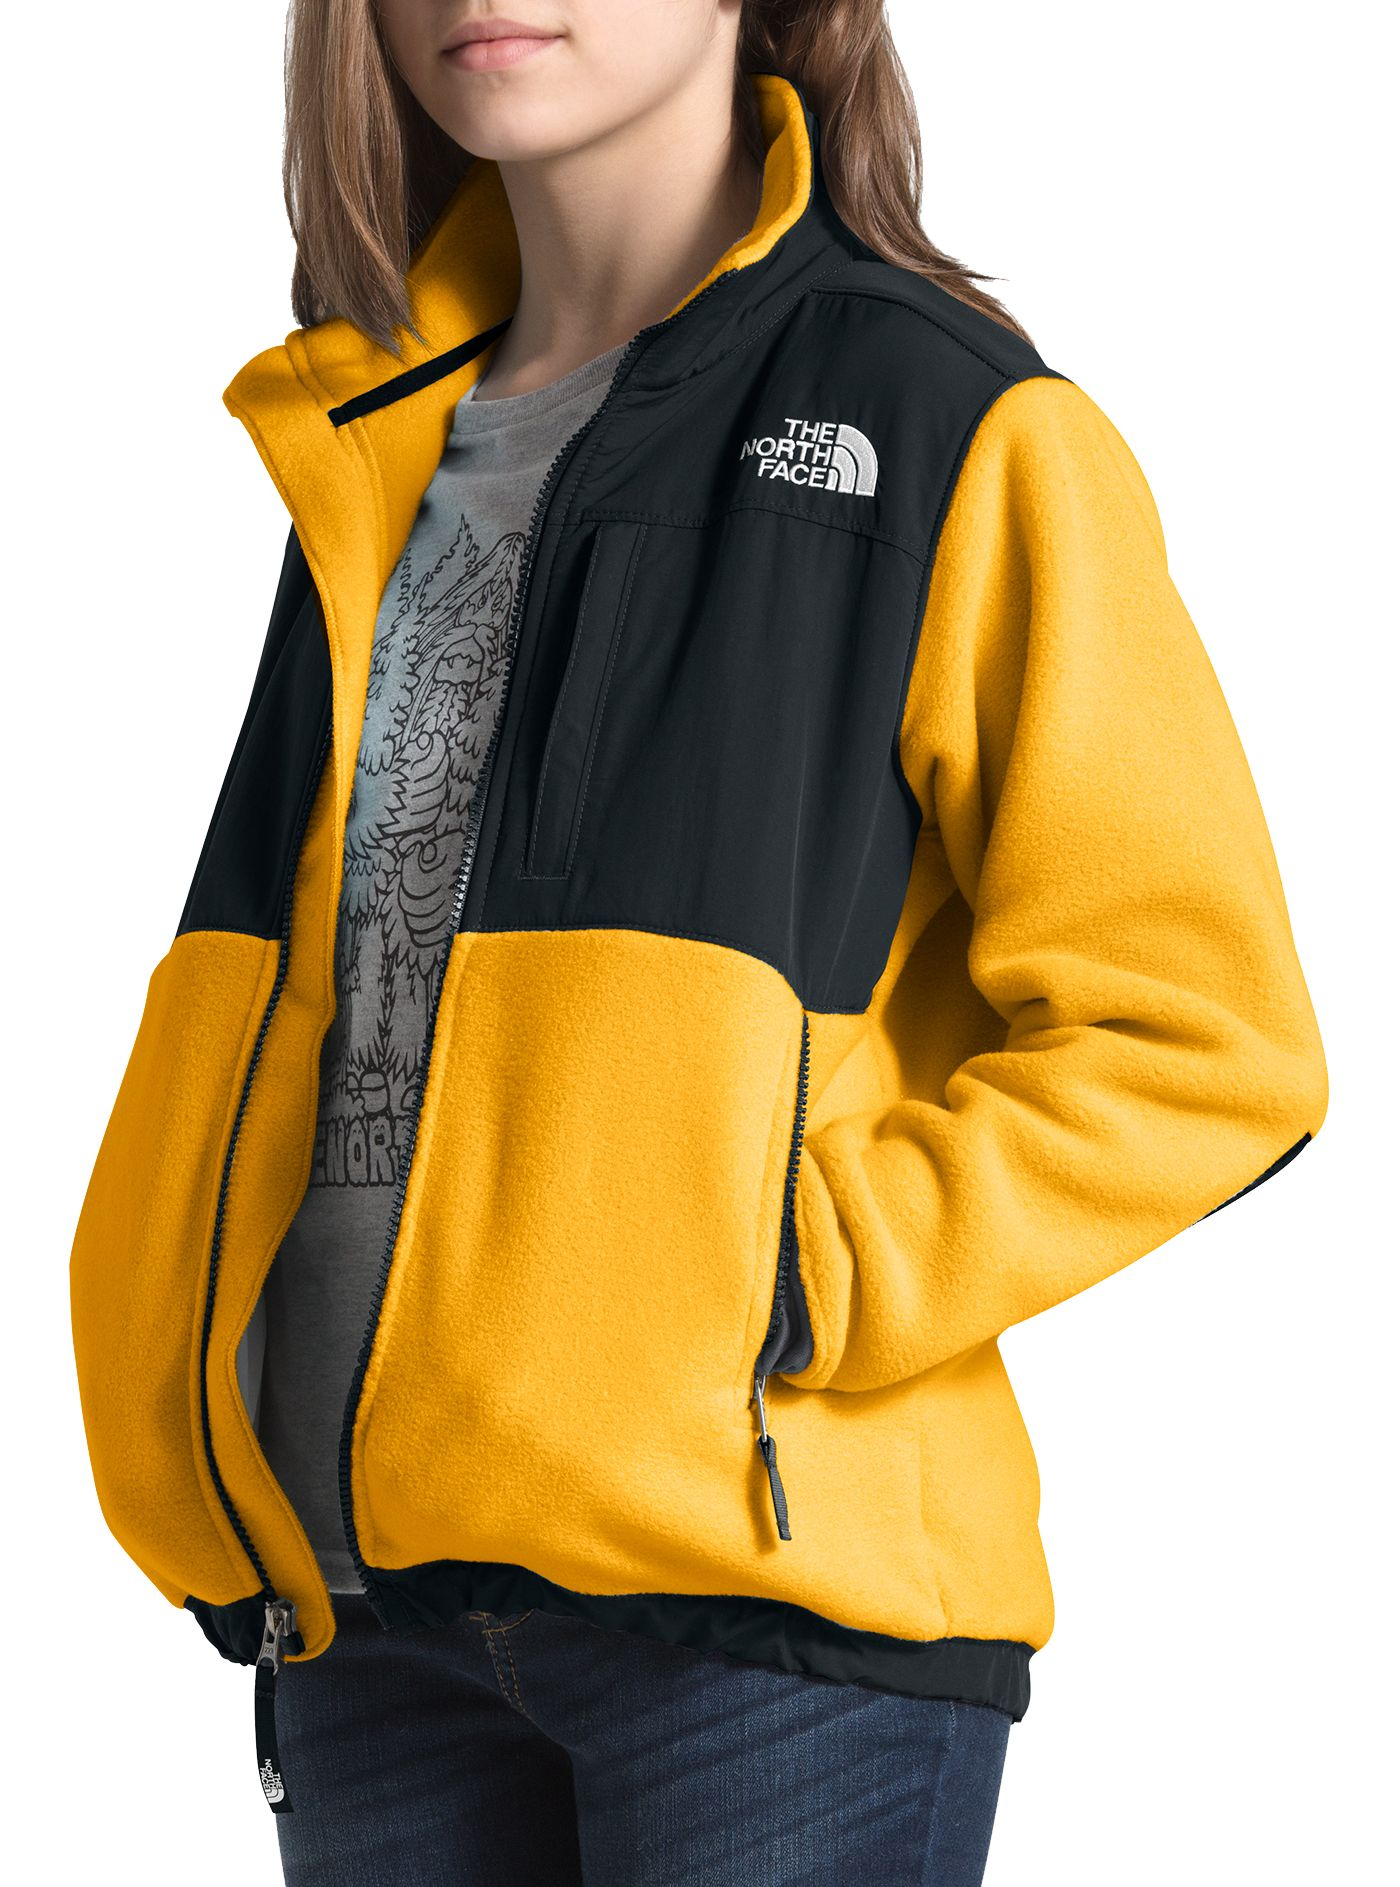 The North Face Youth Denali Fleece Jacket